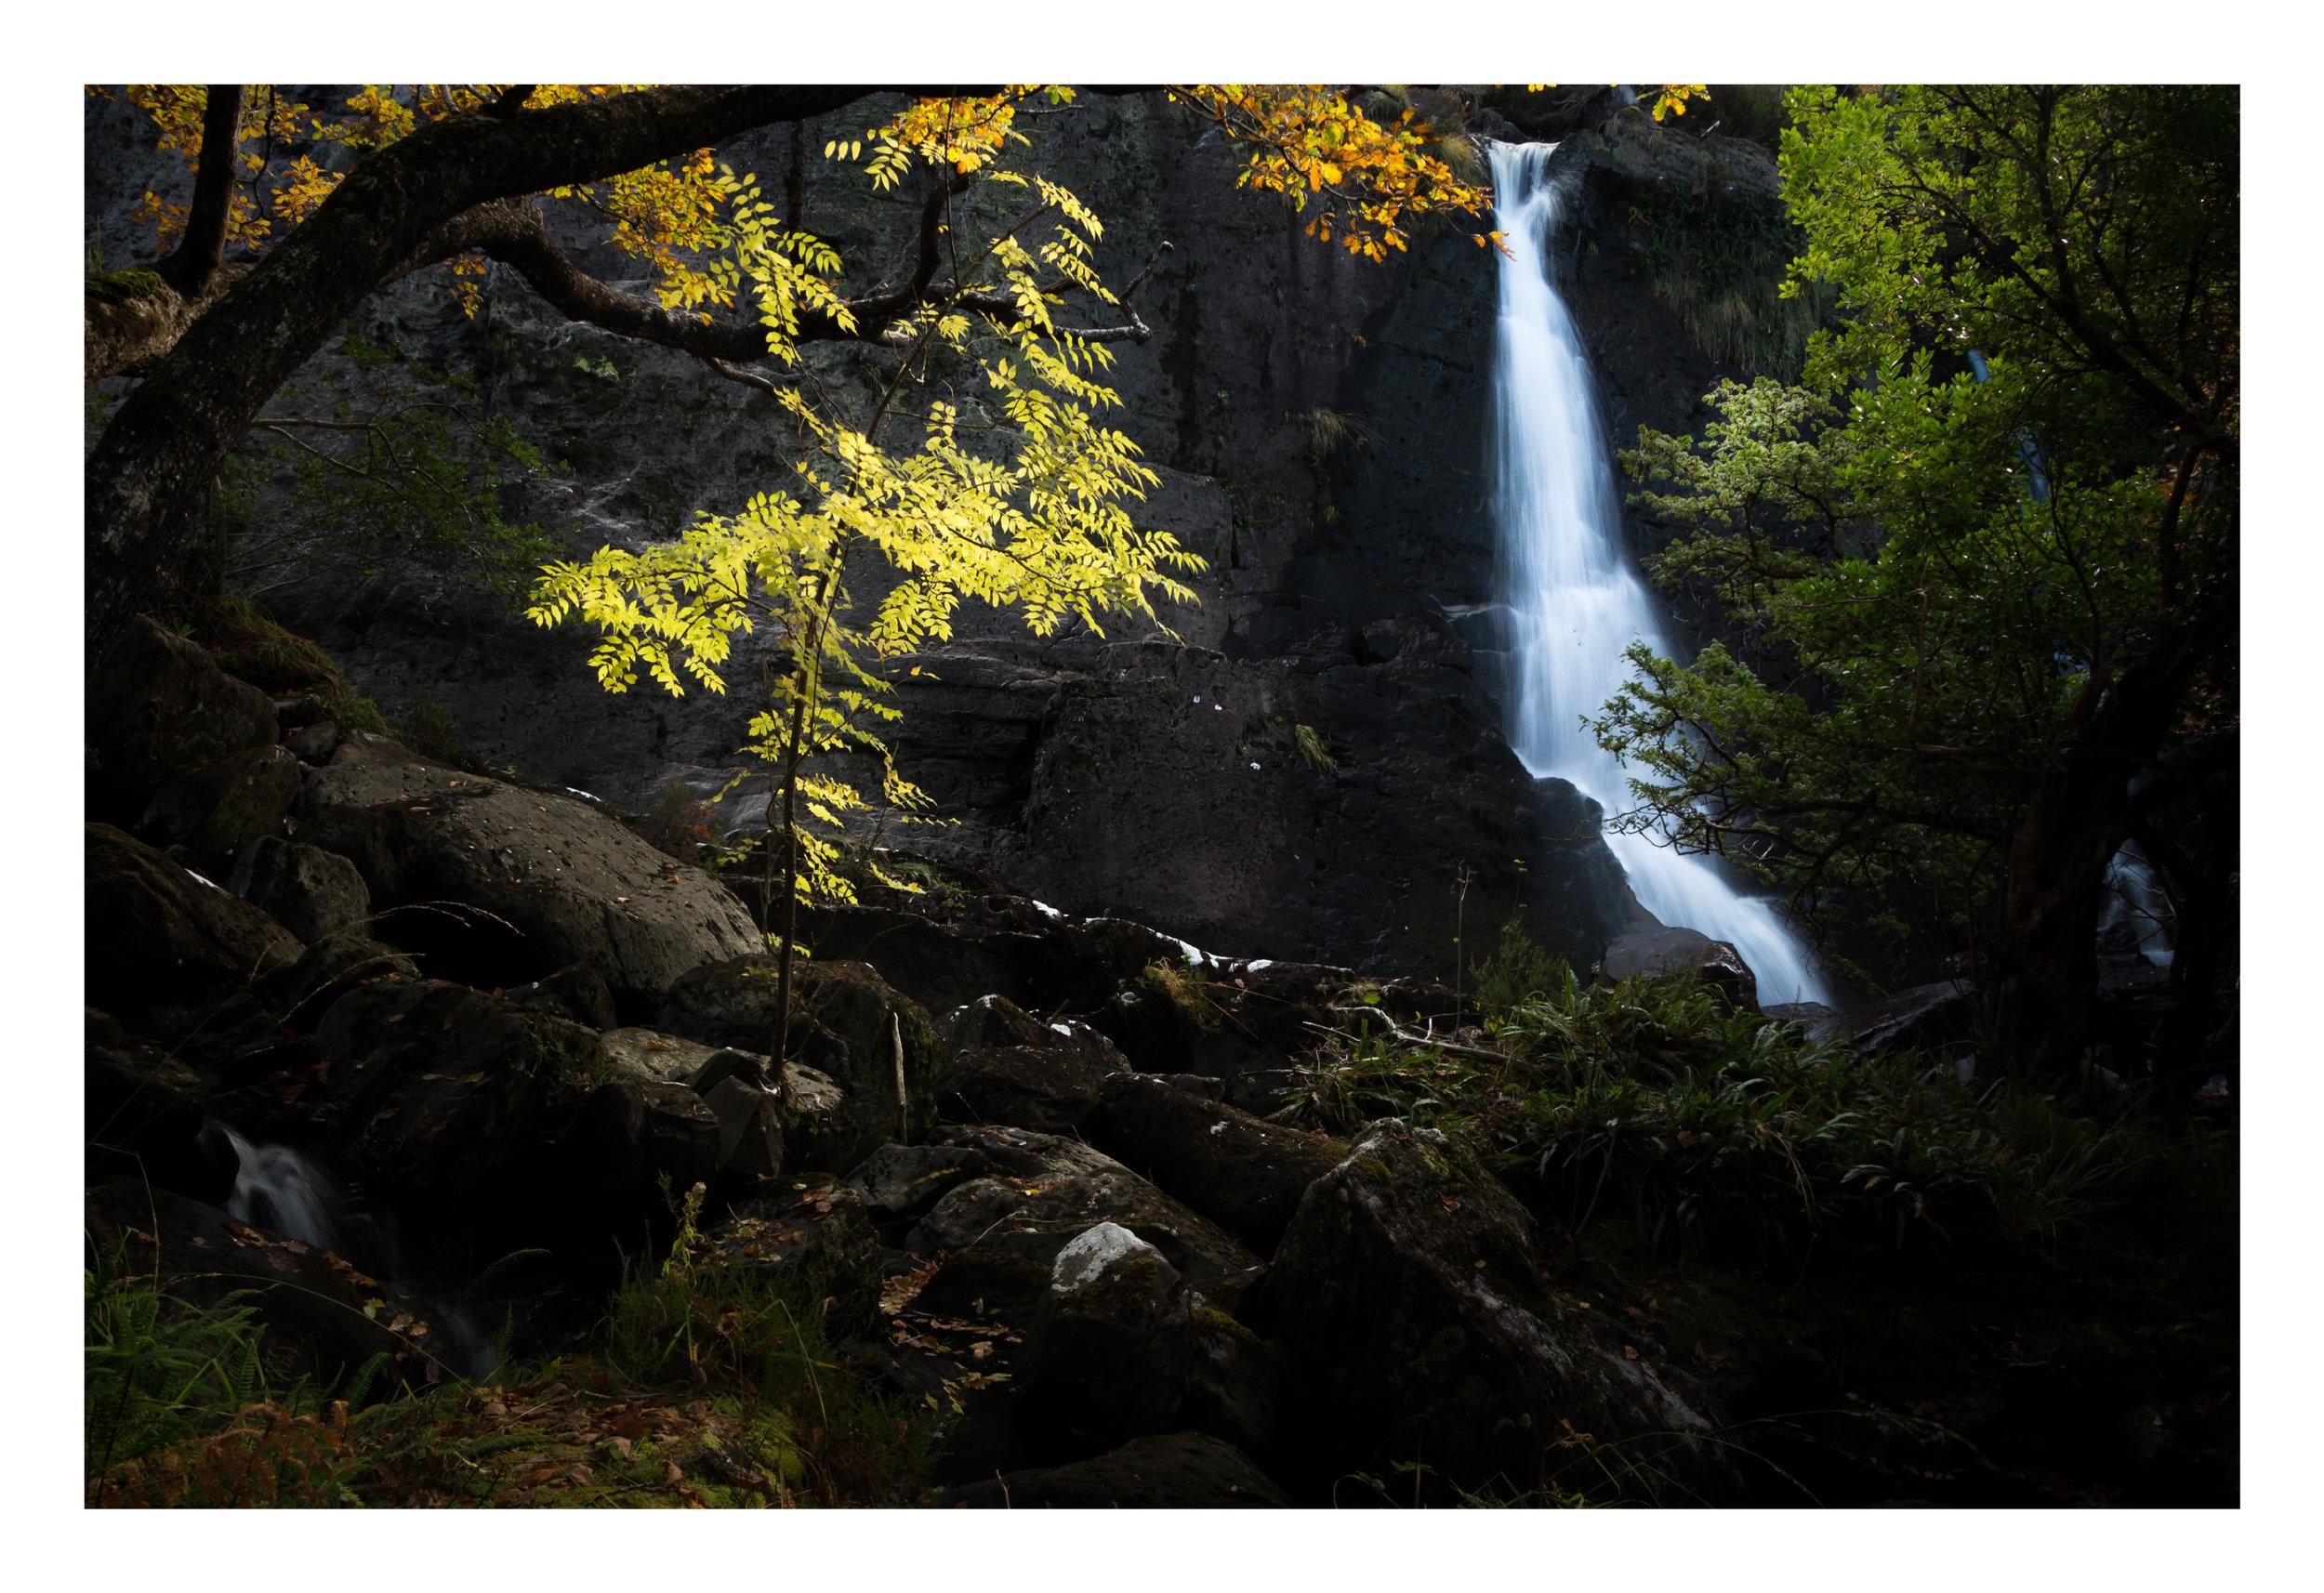 Tower Wood Waterfall Killarney.jpg